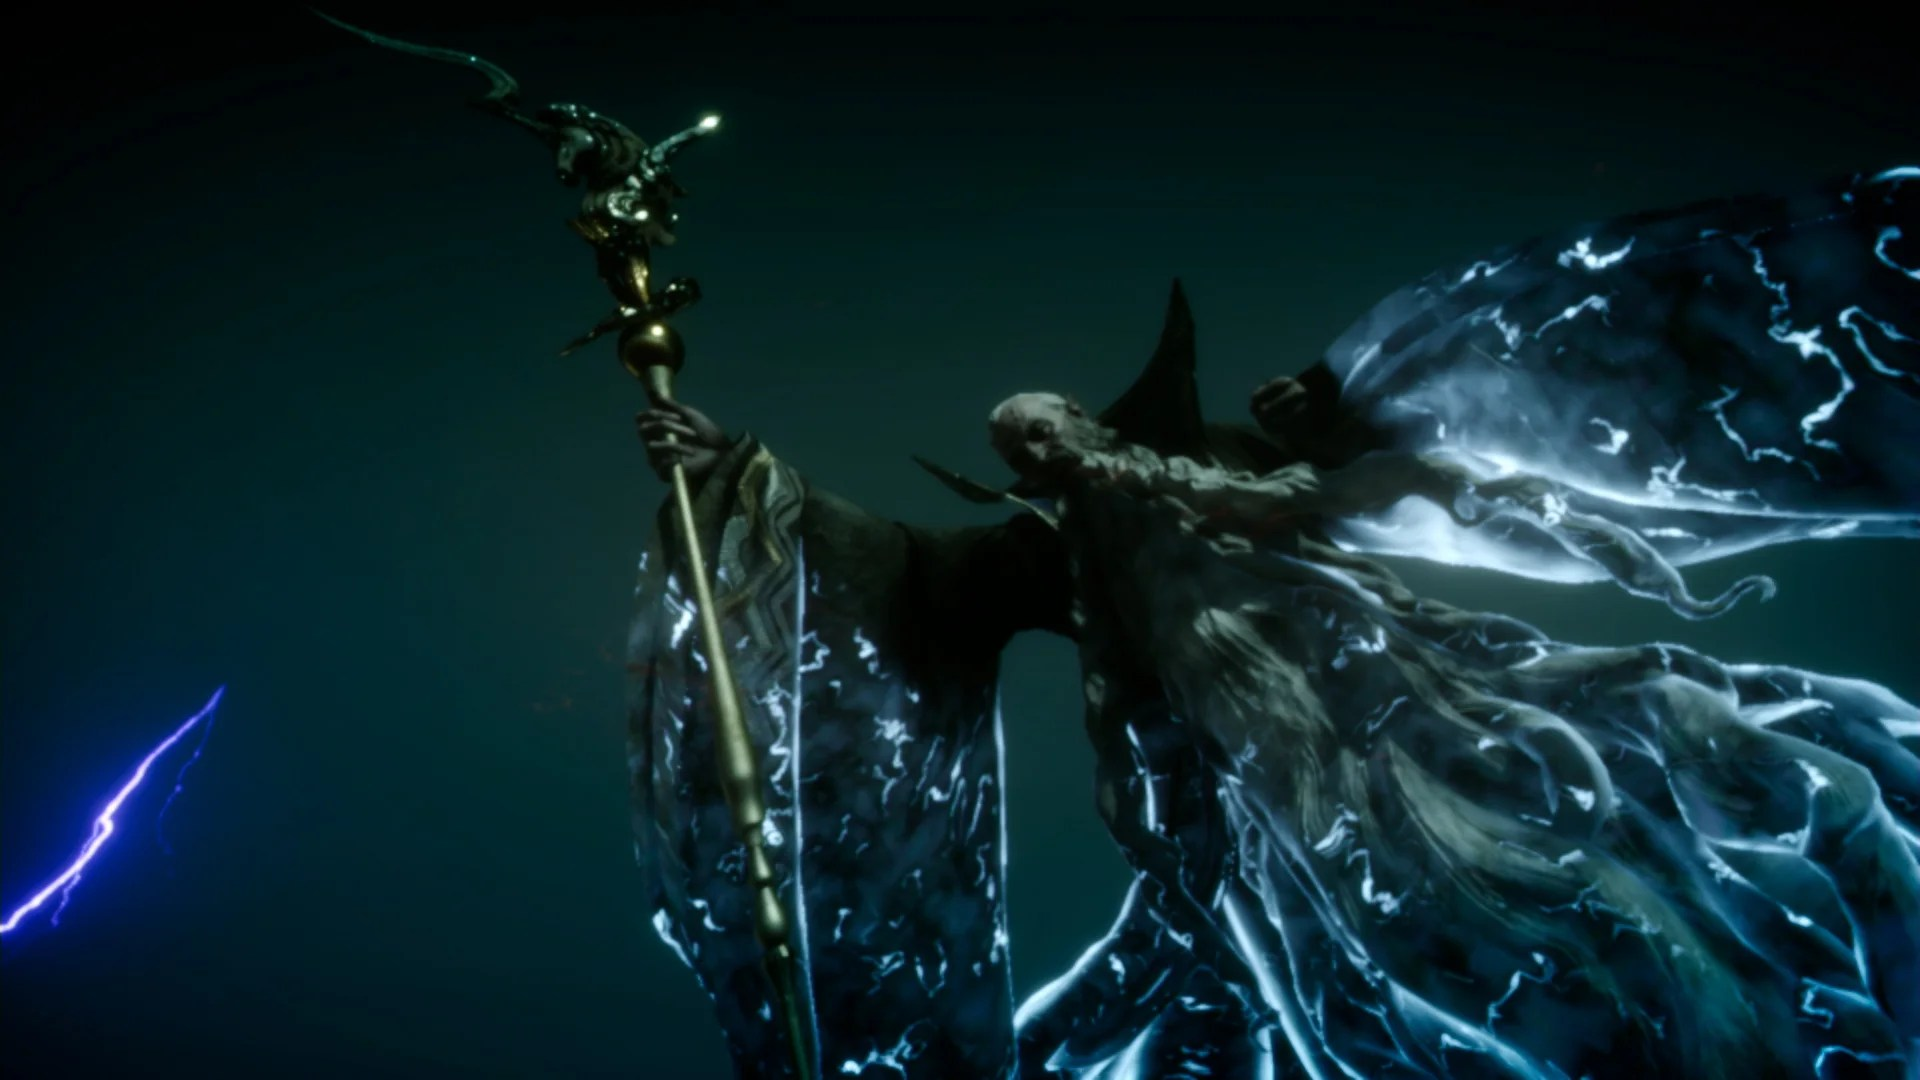 summons final fantasy xv